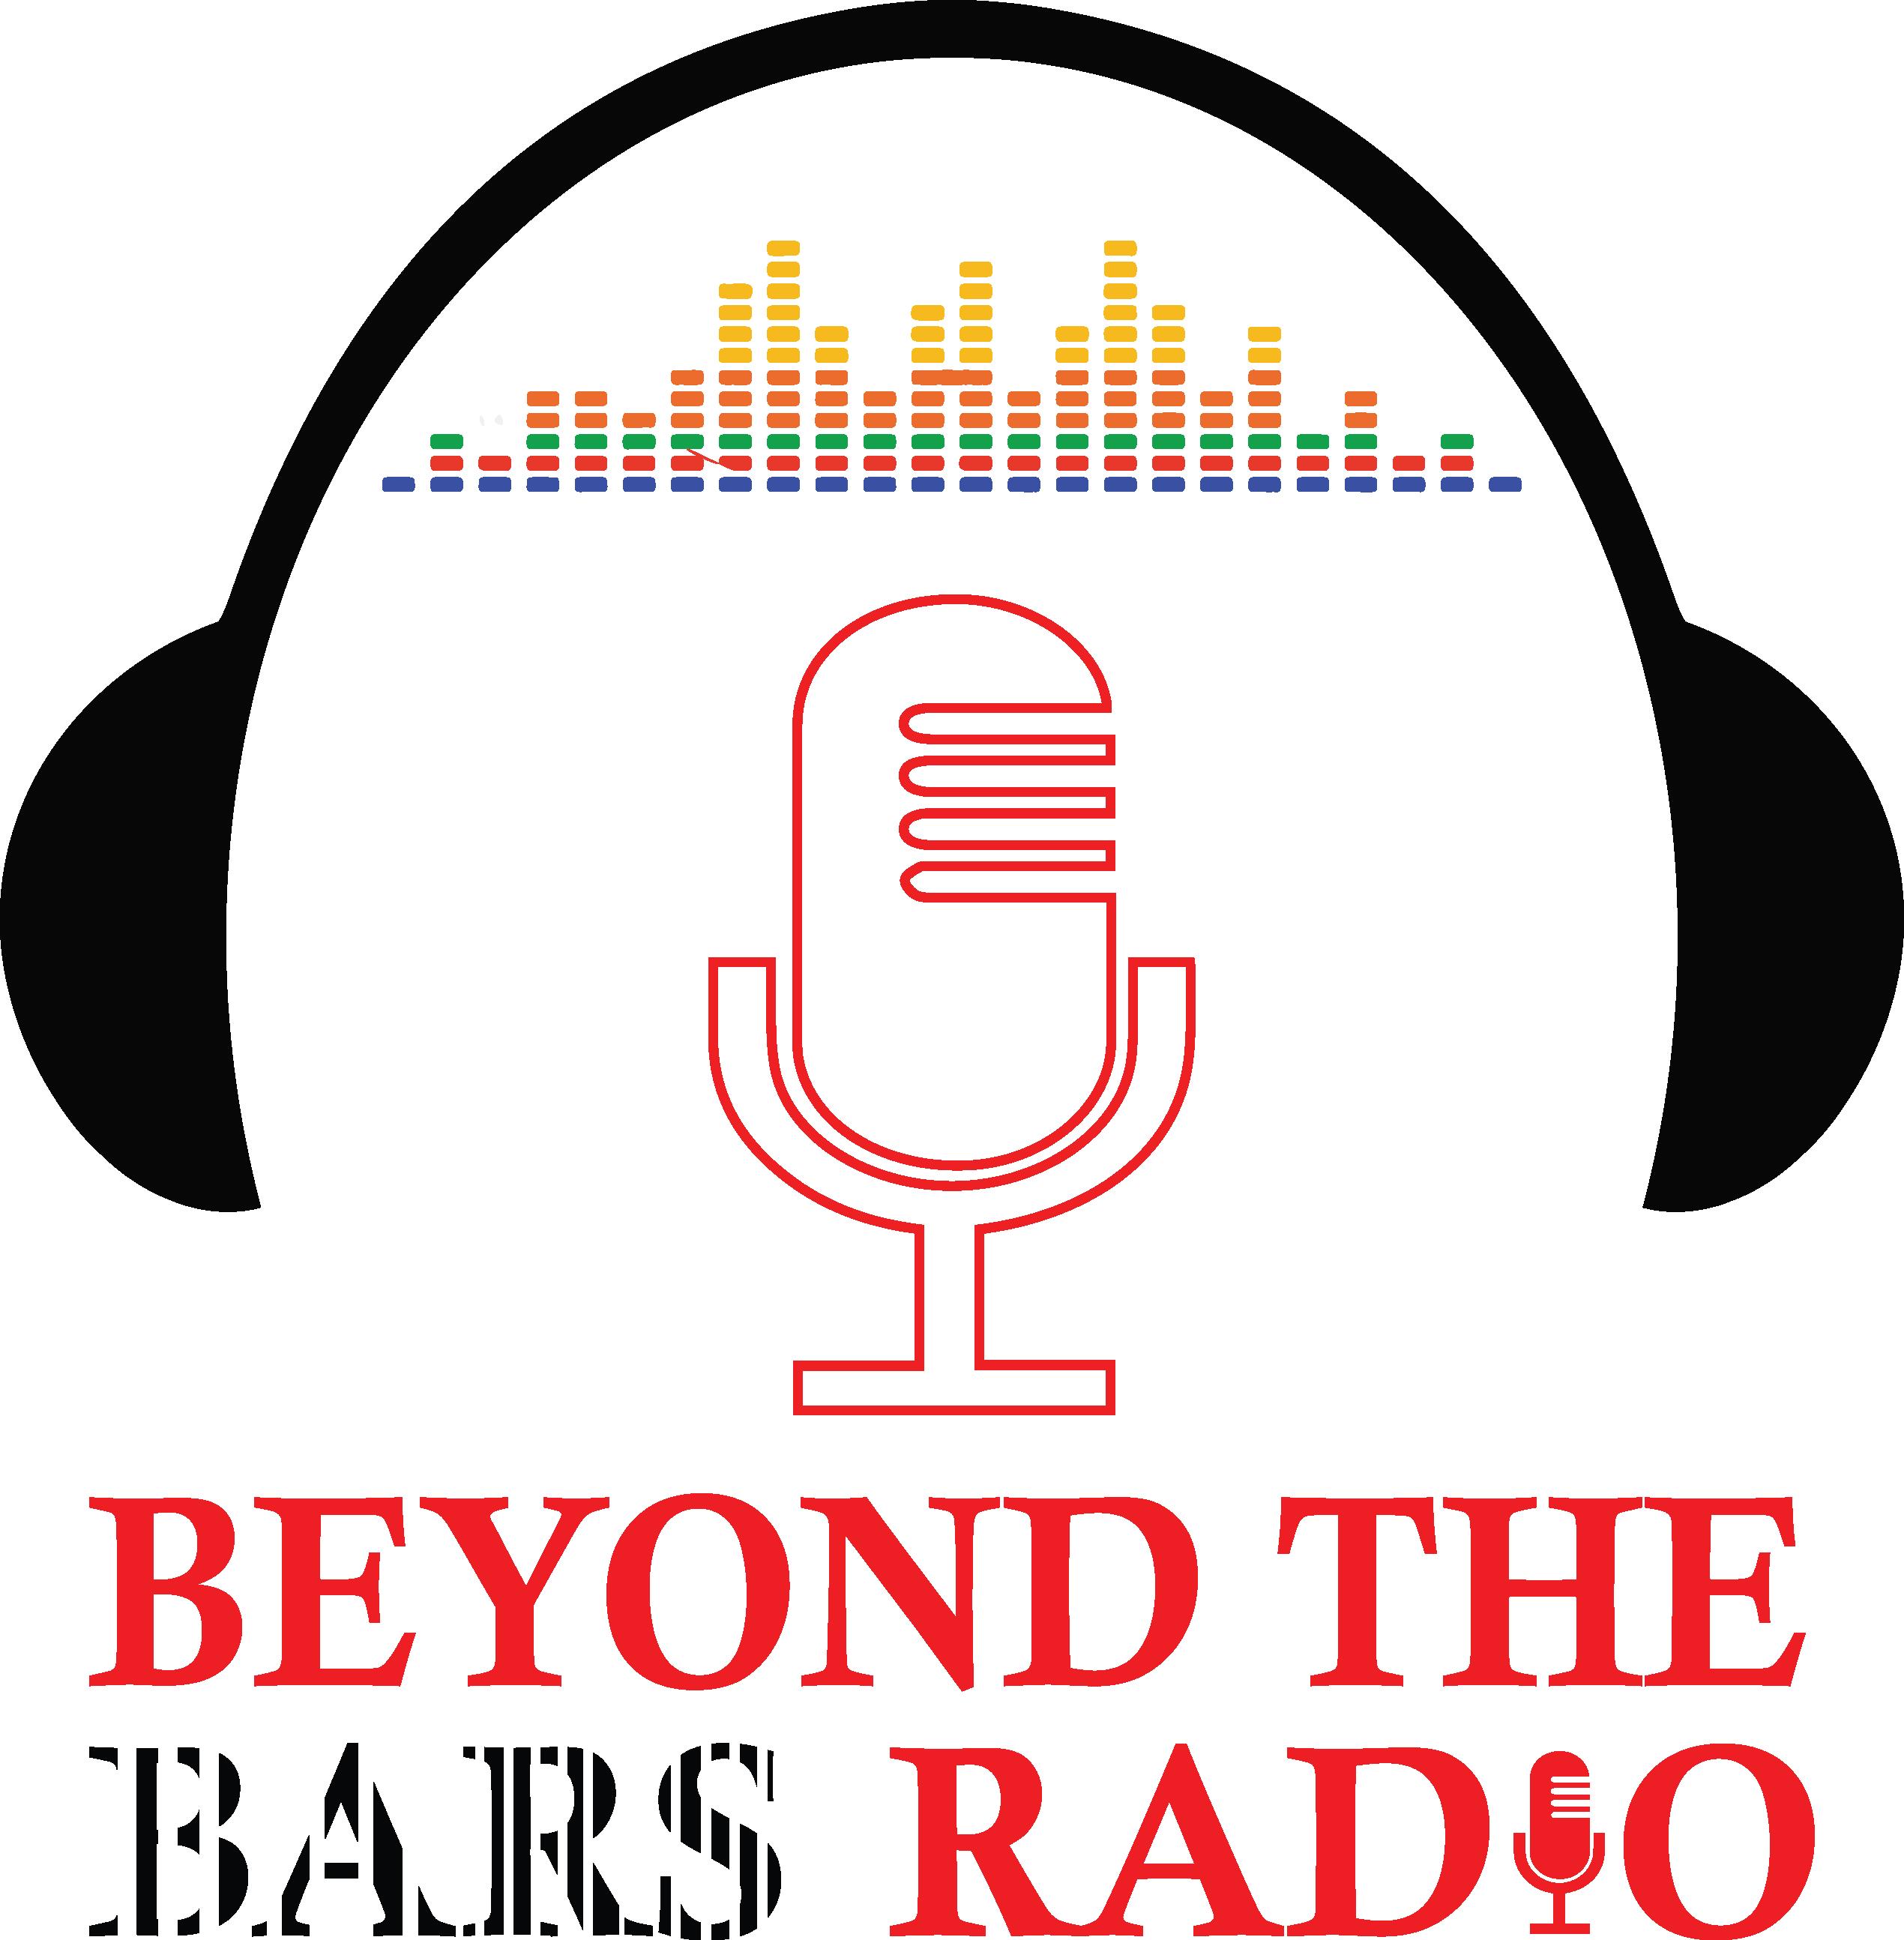 Beyond The Bars Radio